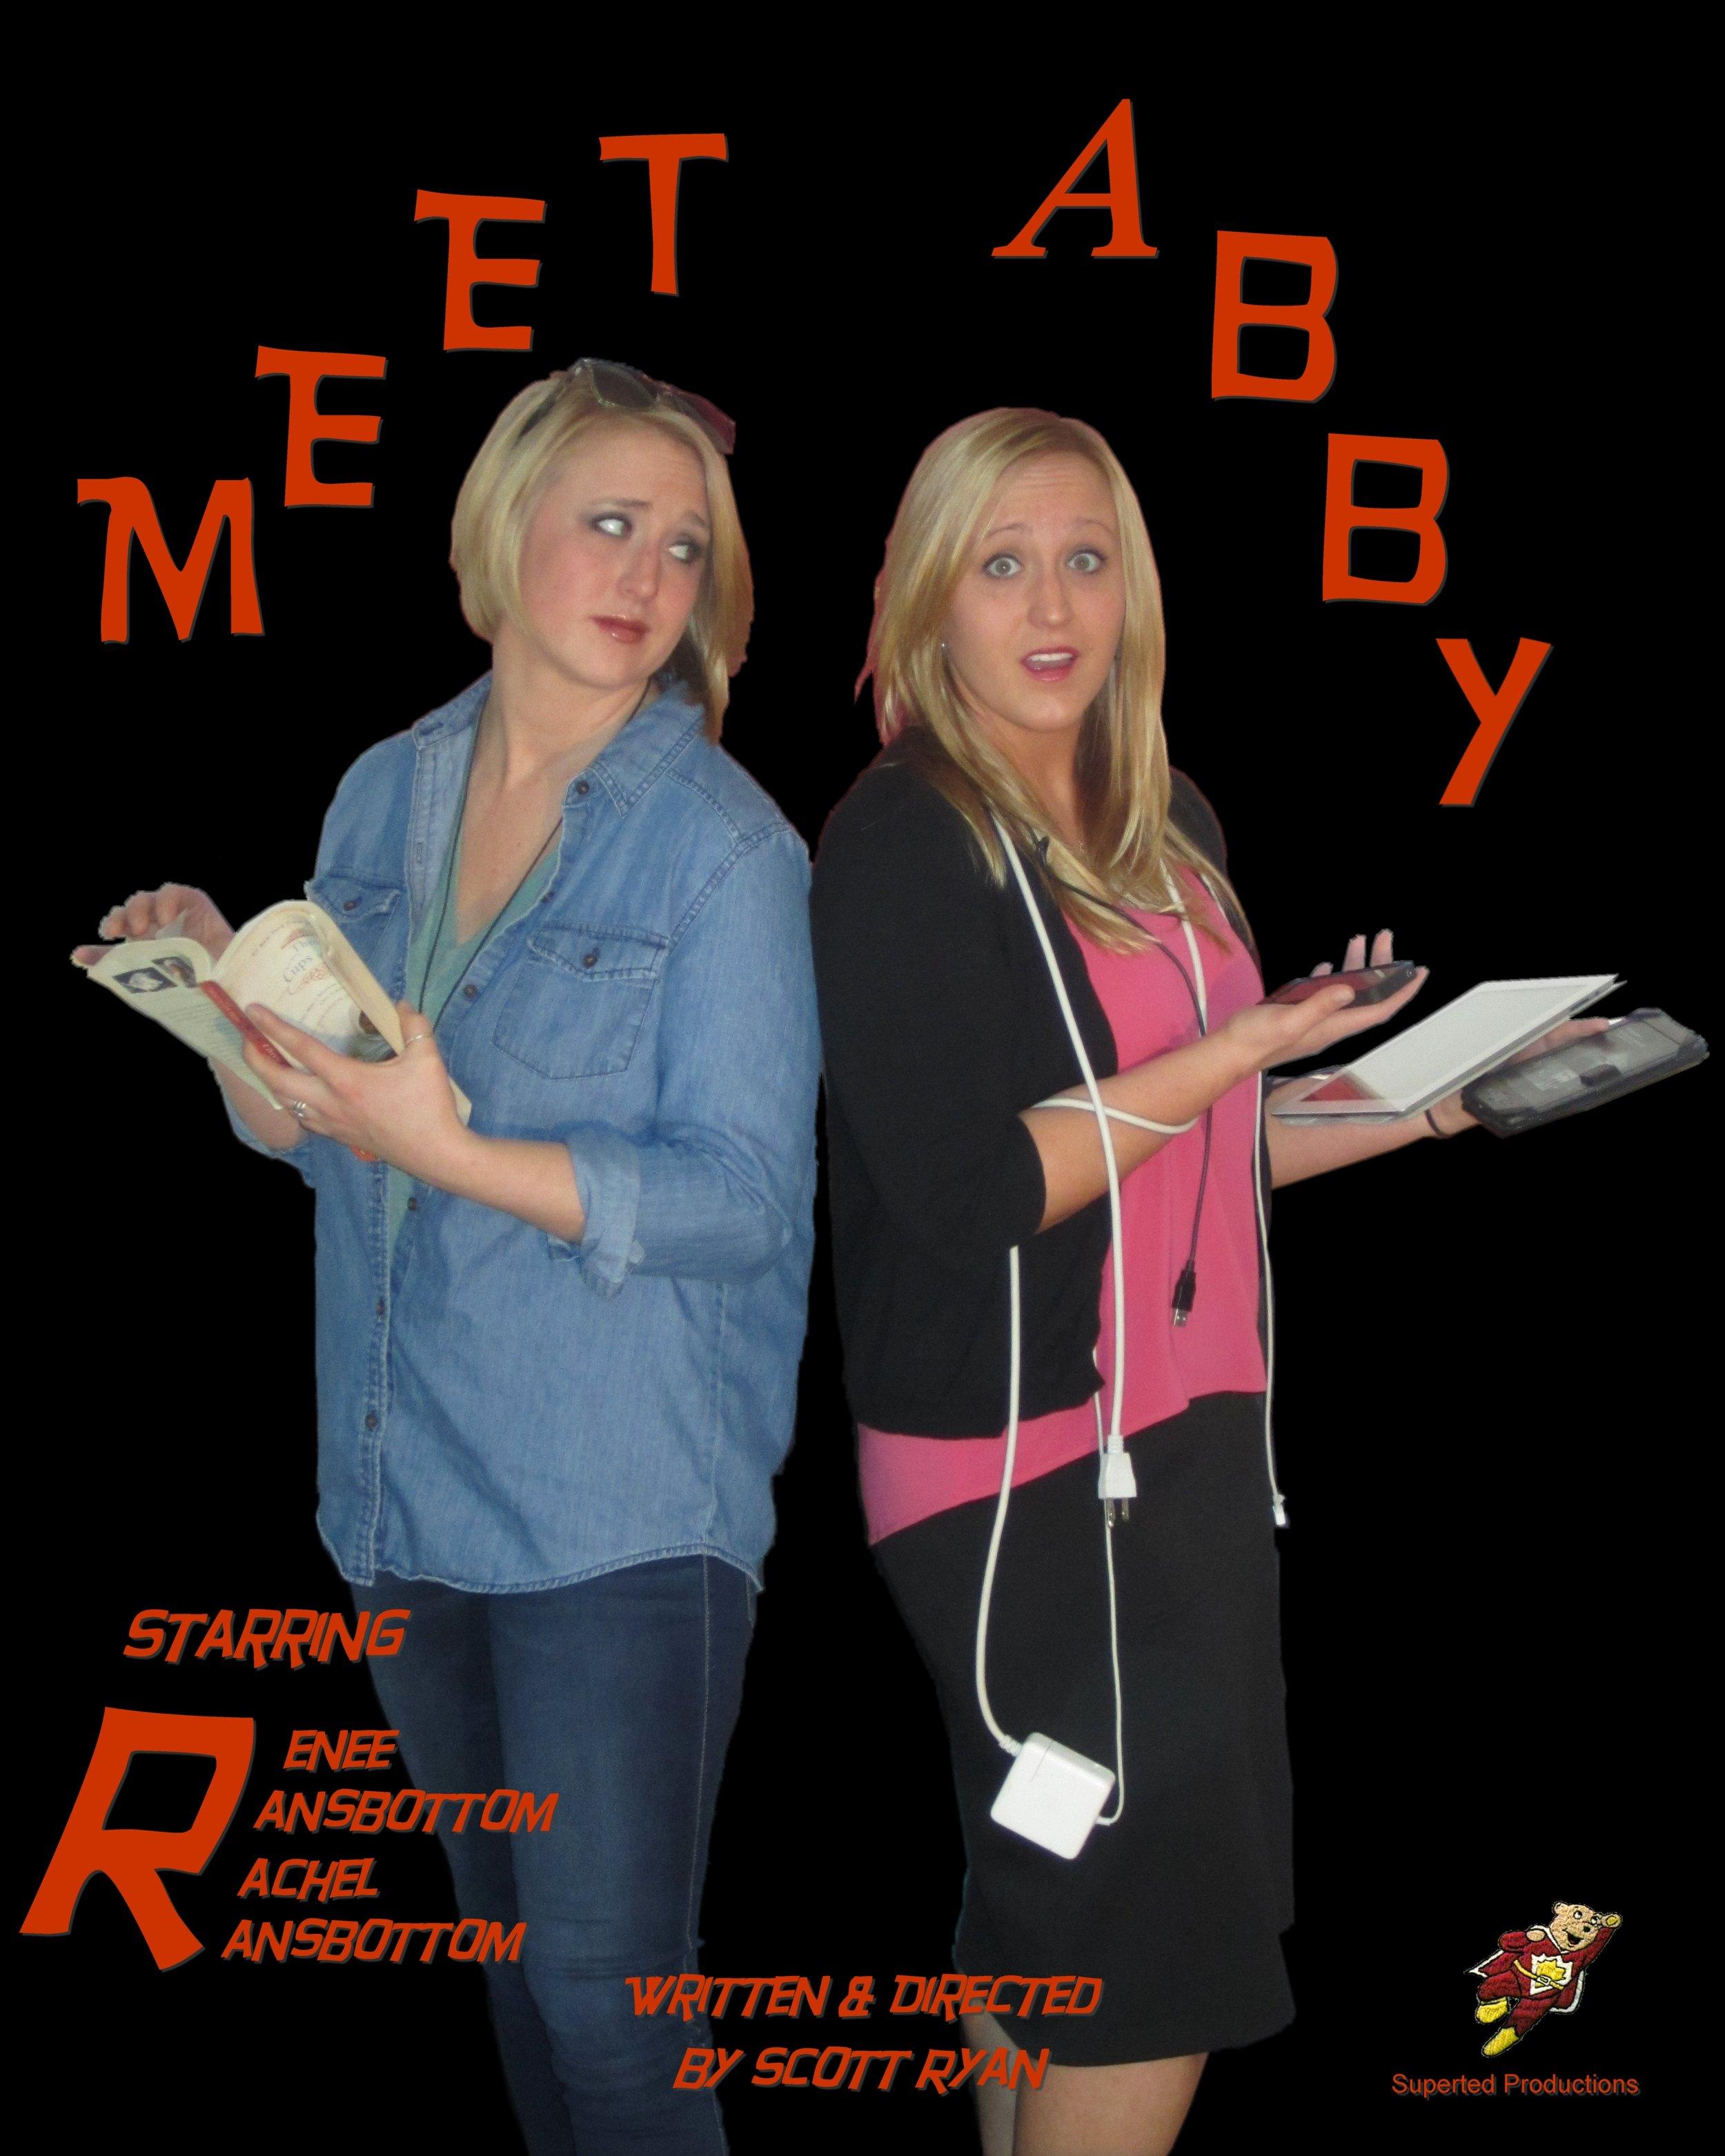 meet abby poster Promo